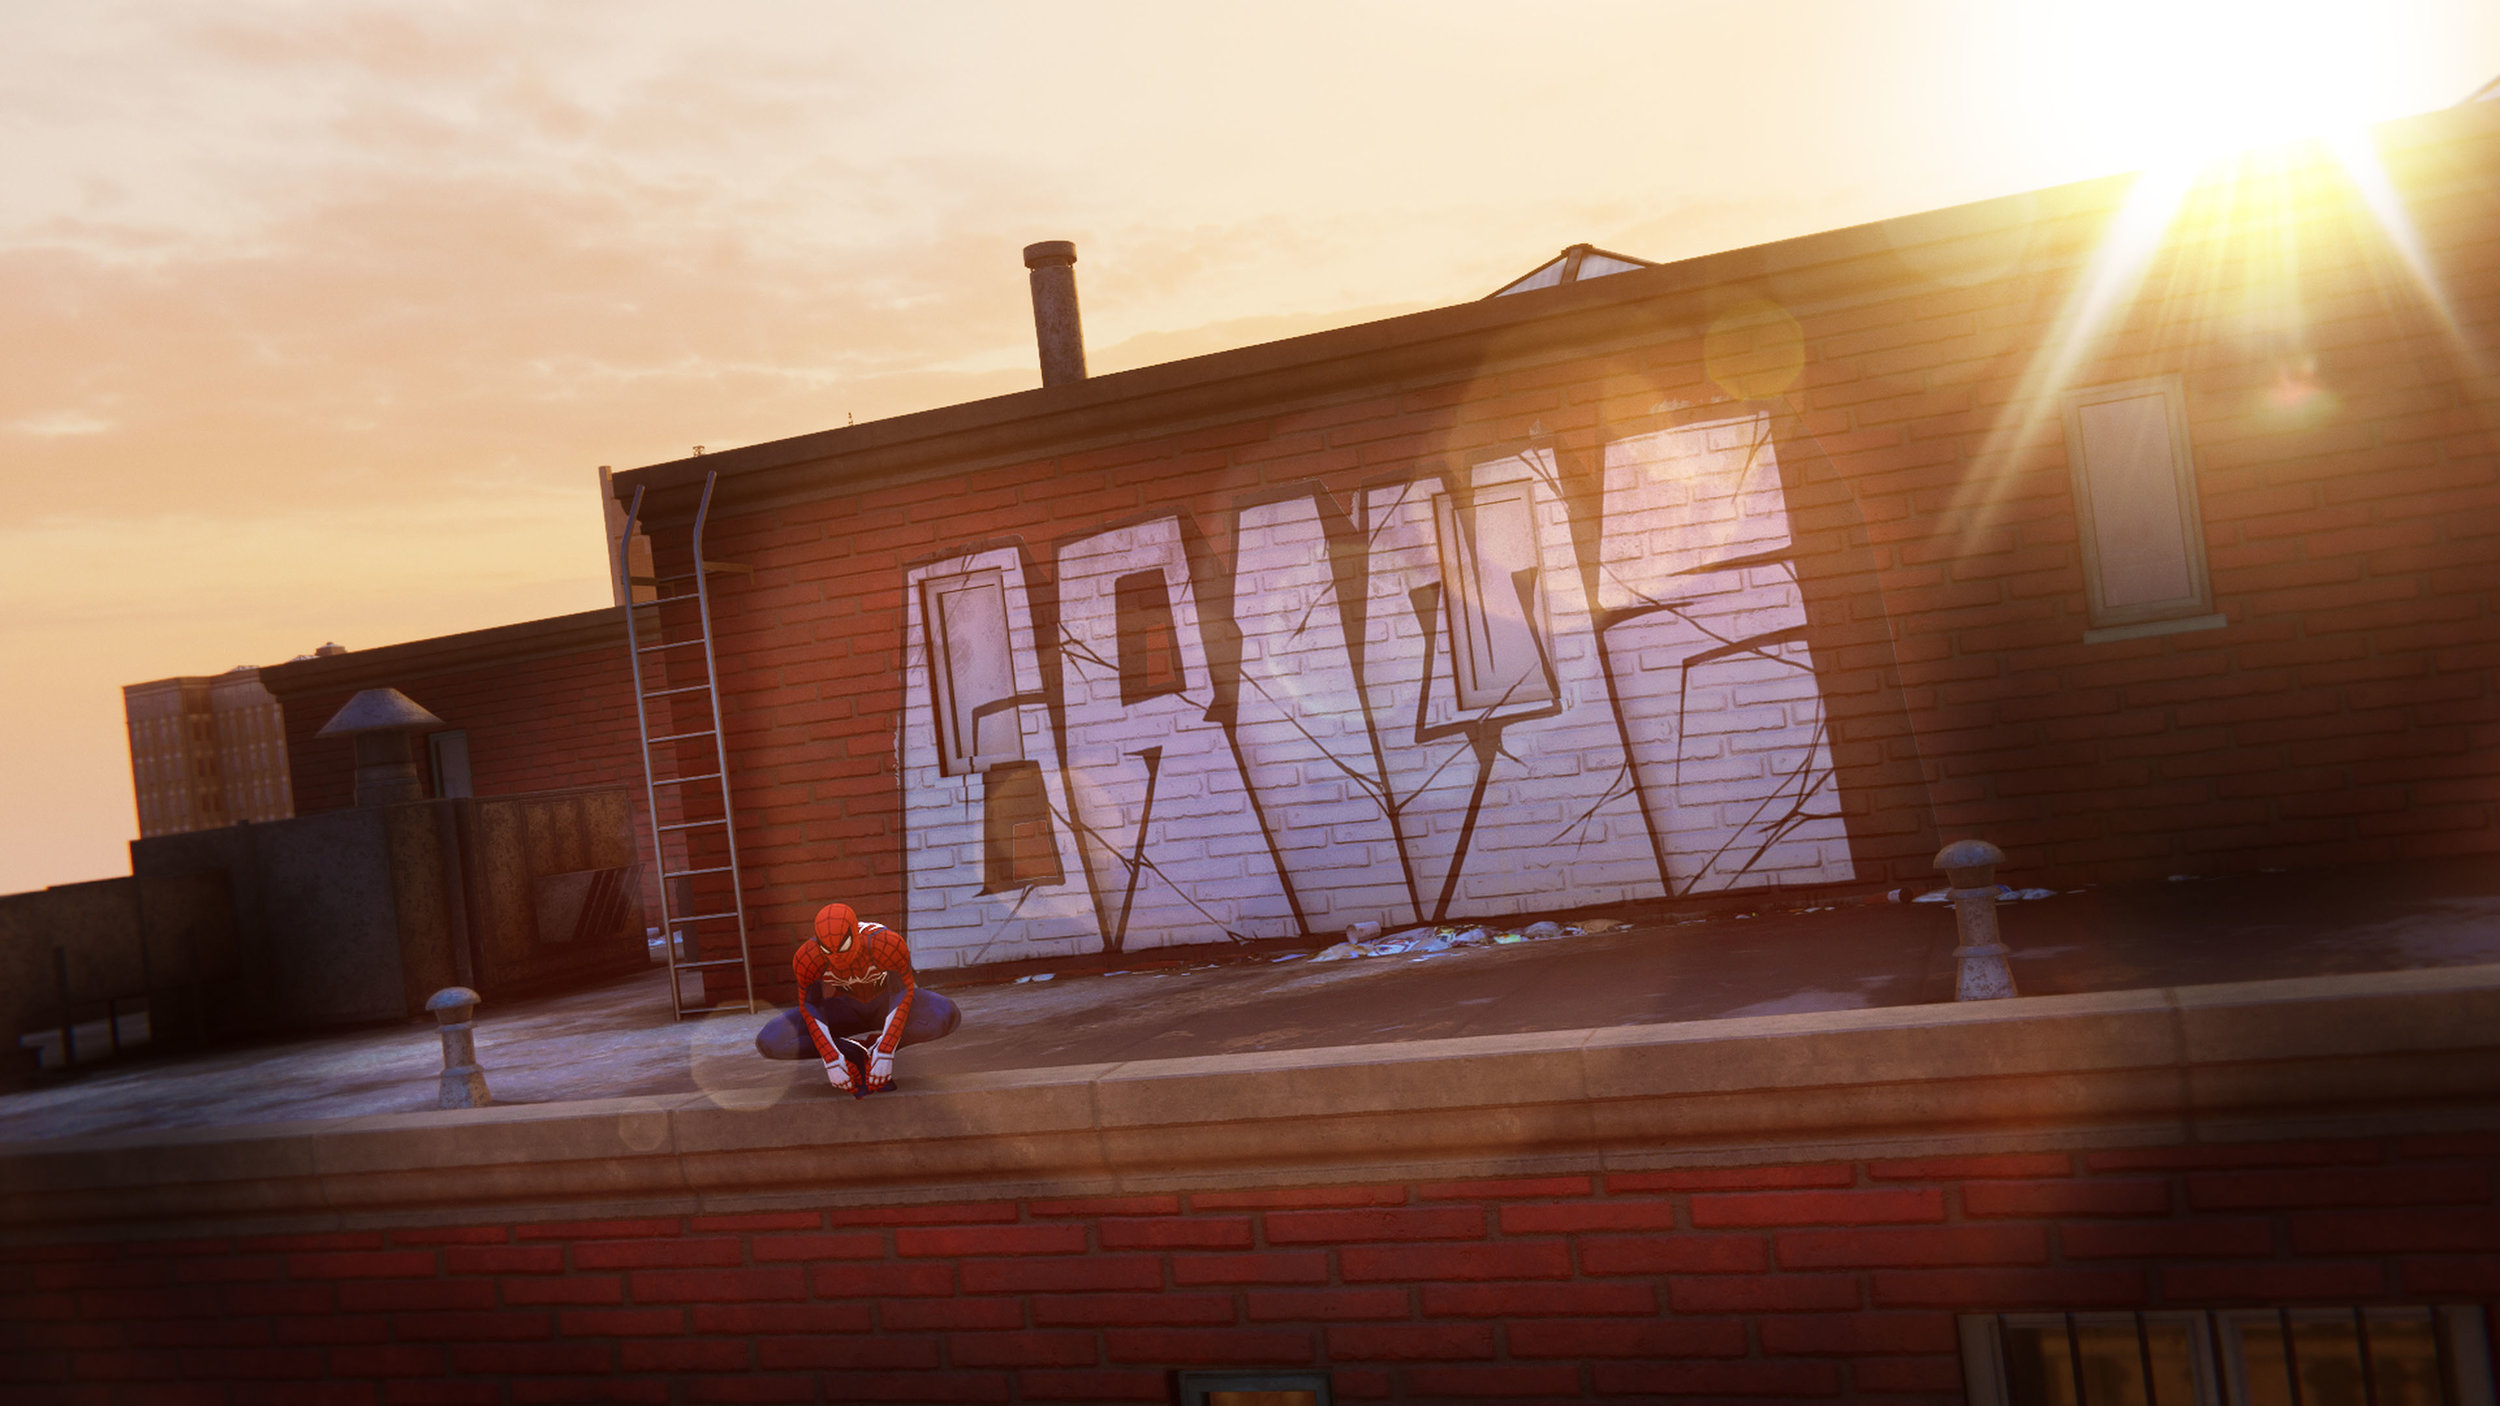 GRIME_Marvel's Spider-Man_20180925212556.jpg